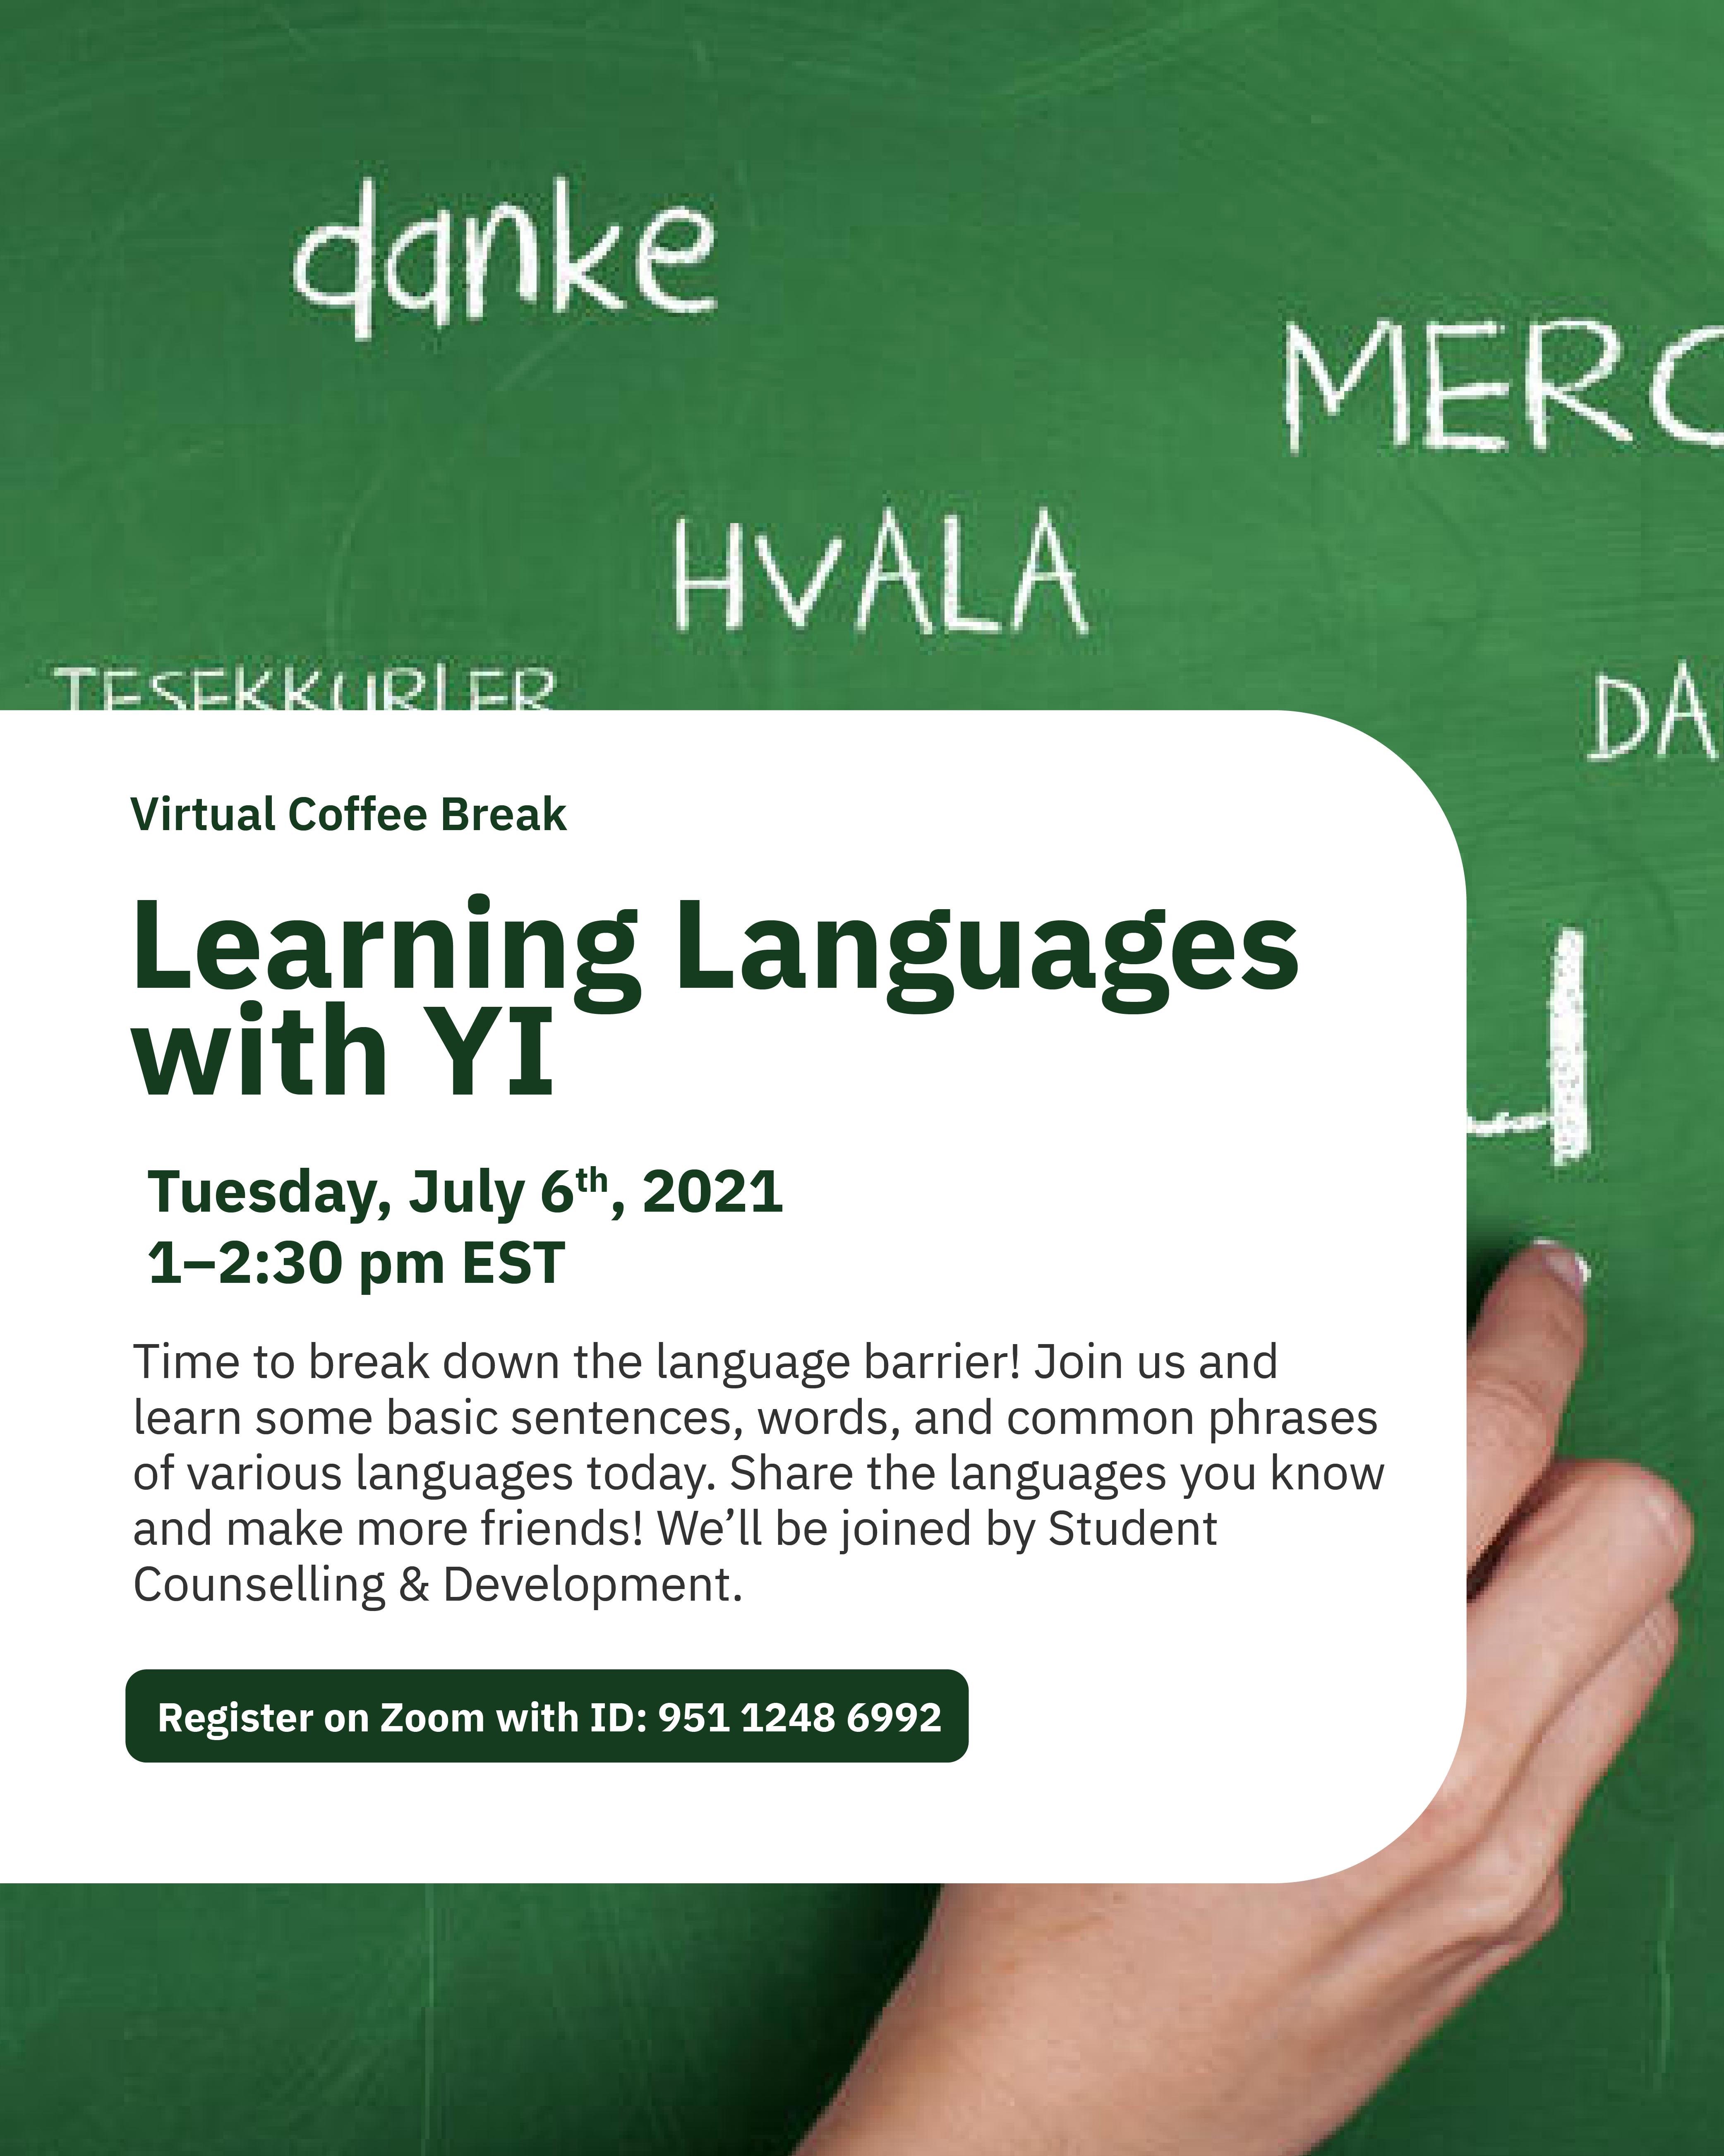 Virtual Coffee Break: Learning Language with YI @ Zoom - York International